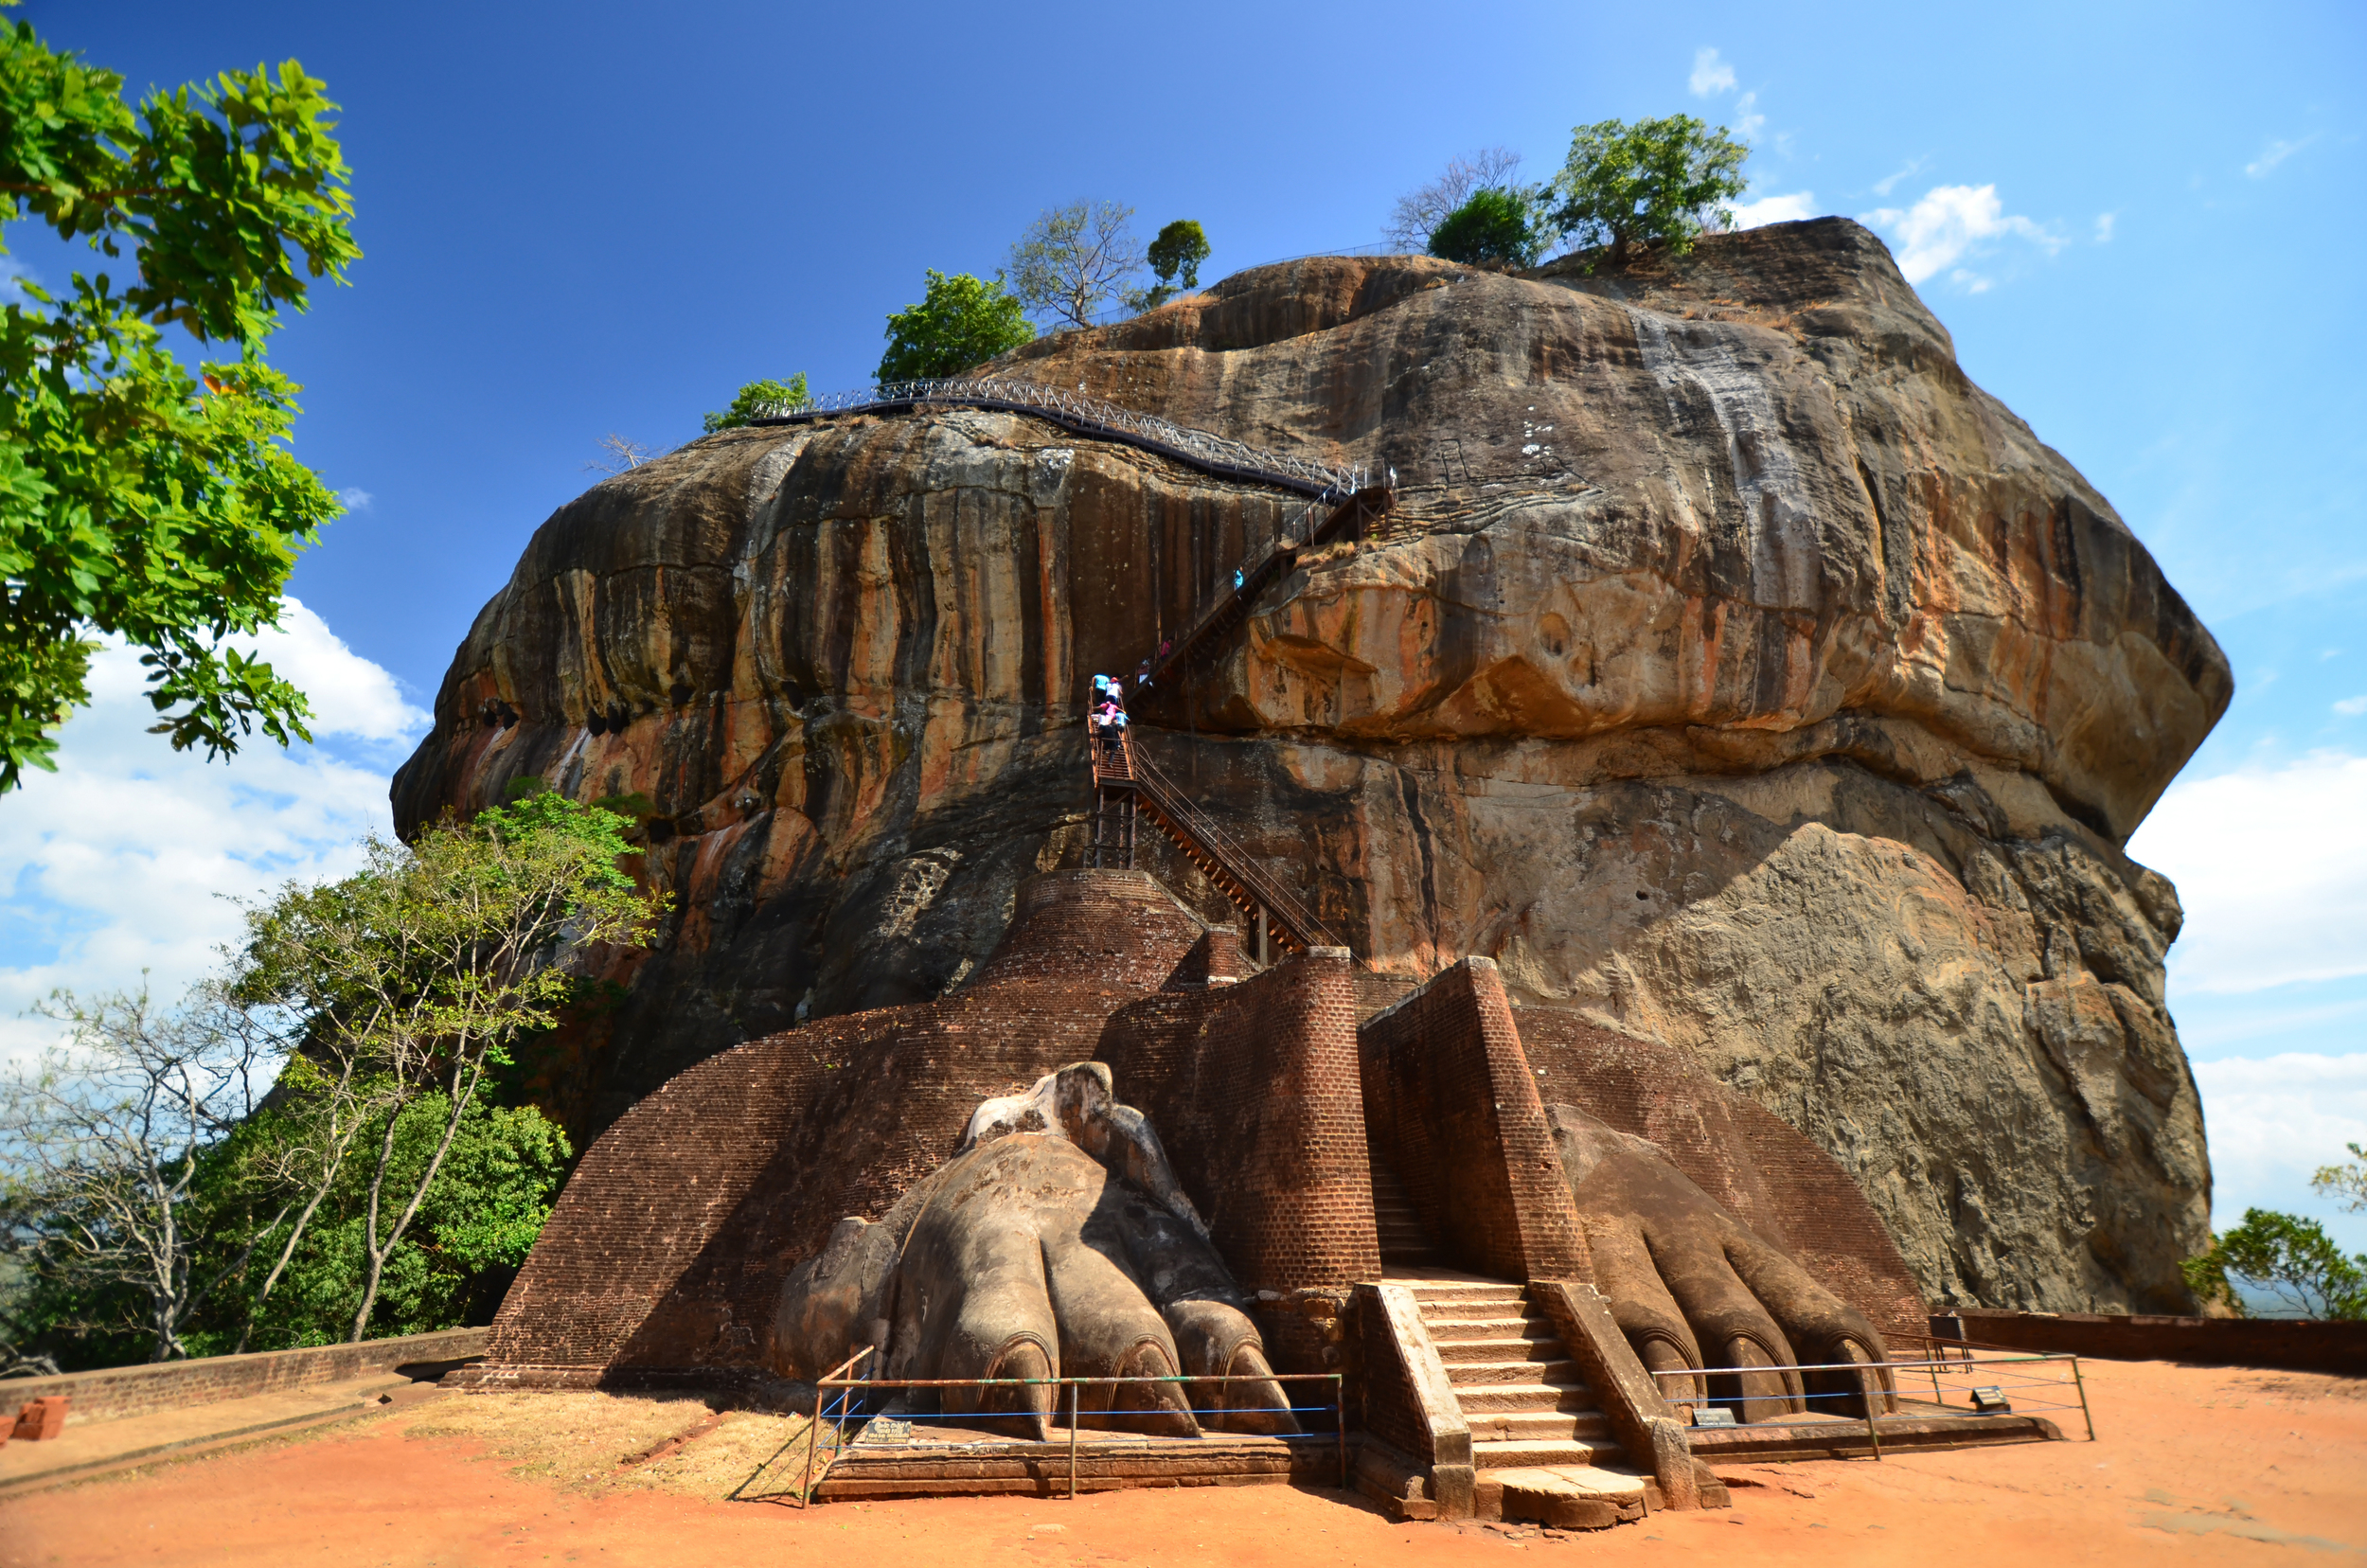 invite-to-paradise-sri-lanka-holiday-honeymoon-sigiriya-rock-fortress-lion-entrance.jpg